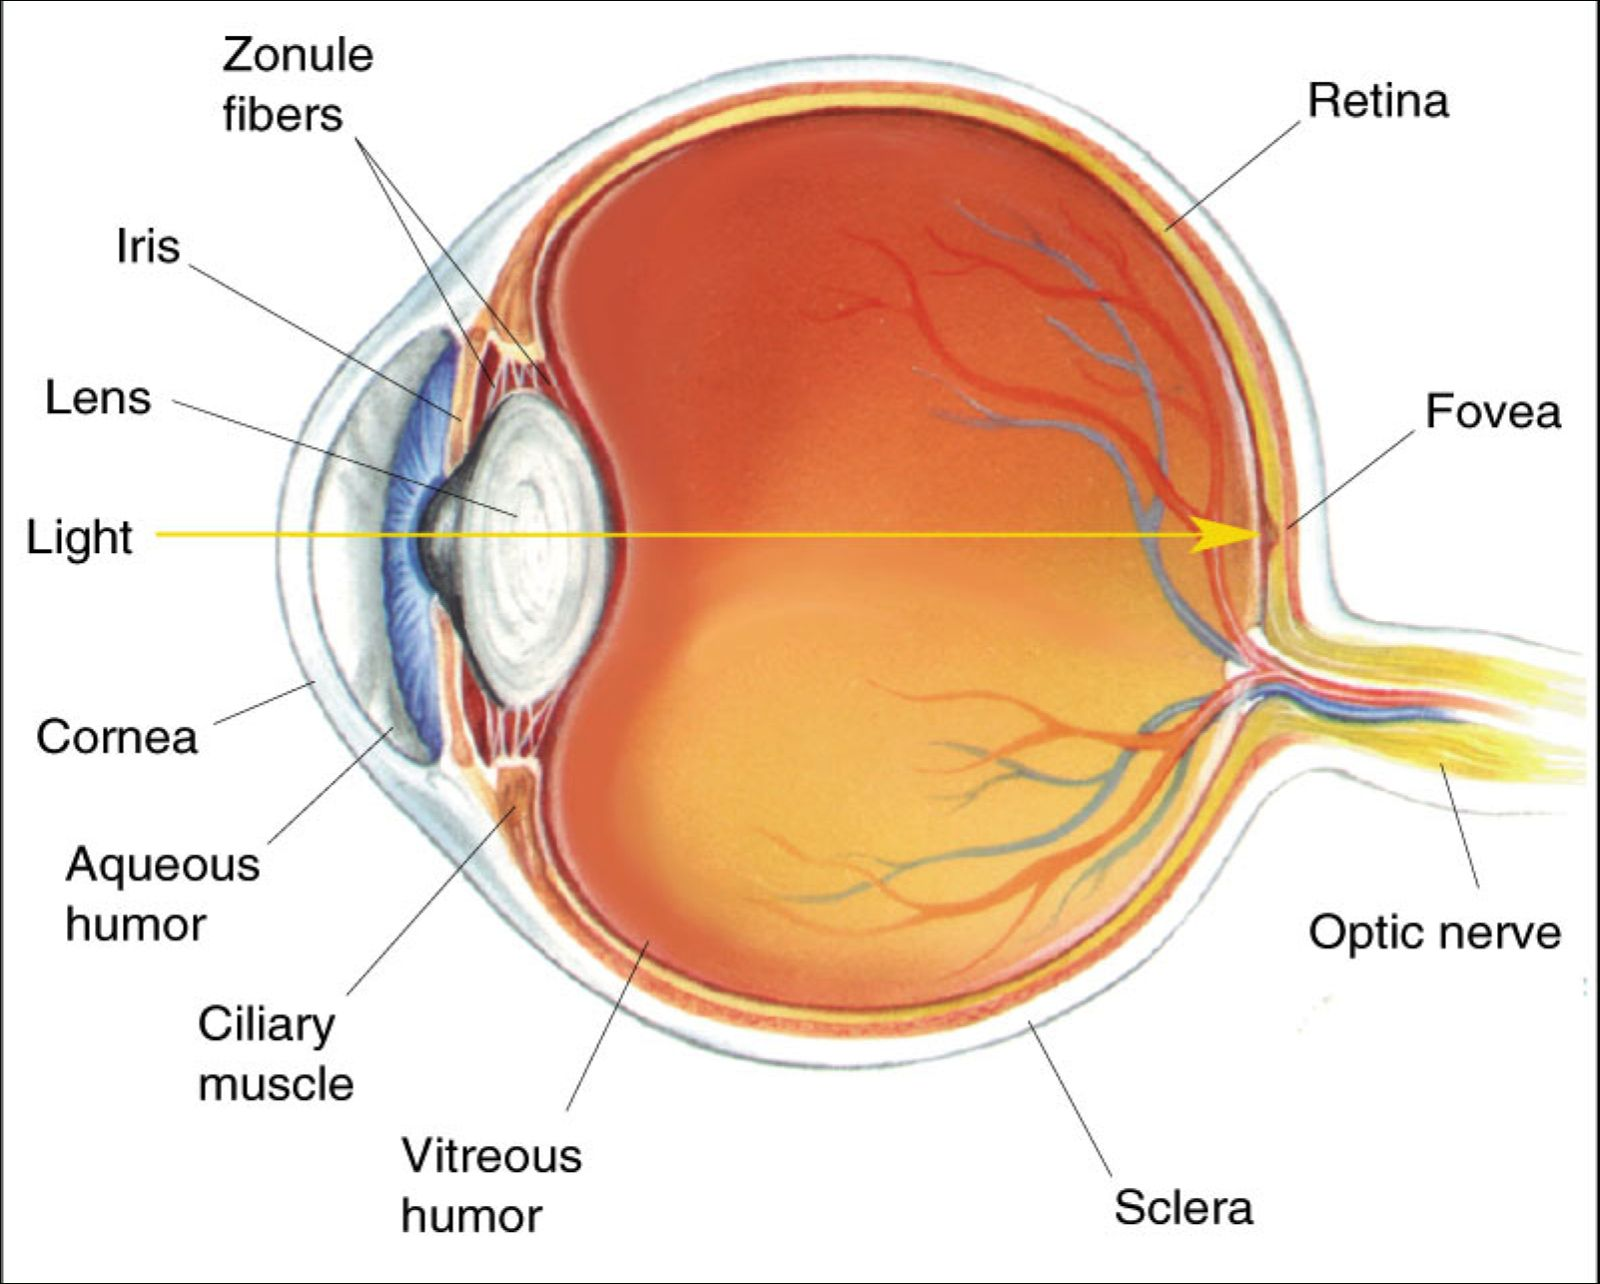 Eye Diagram Unlabelled Human Eye Diagram Unlabelled Human